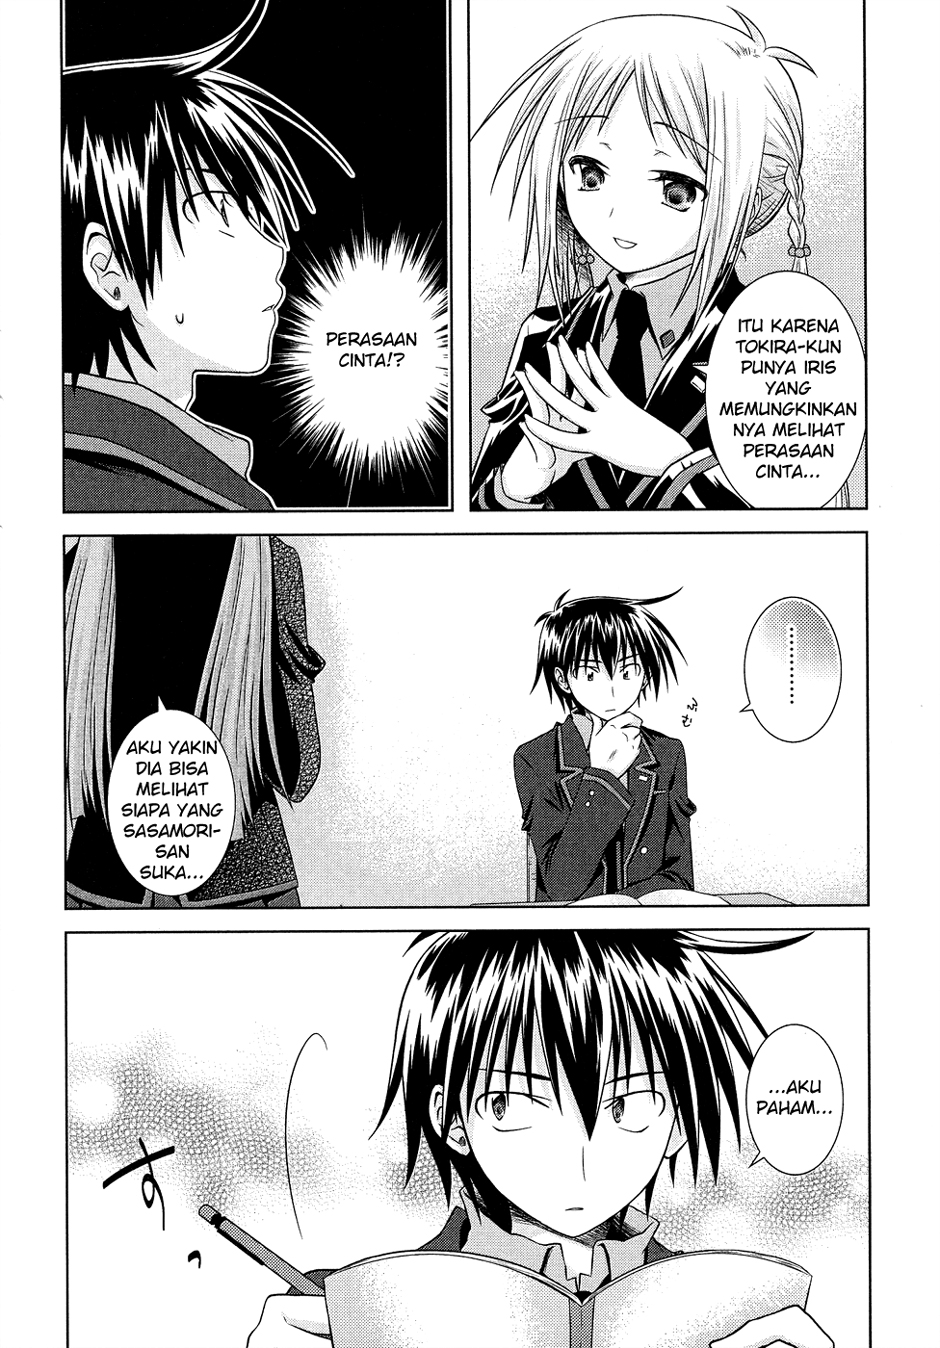 Komik iris zero 011 12 Indonesia iris zero 011 Terbaru 9 Baca Manga Komik Indonesia 